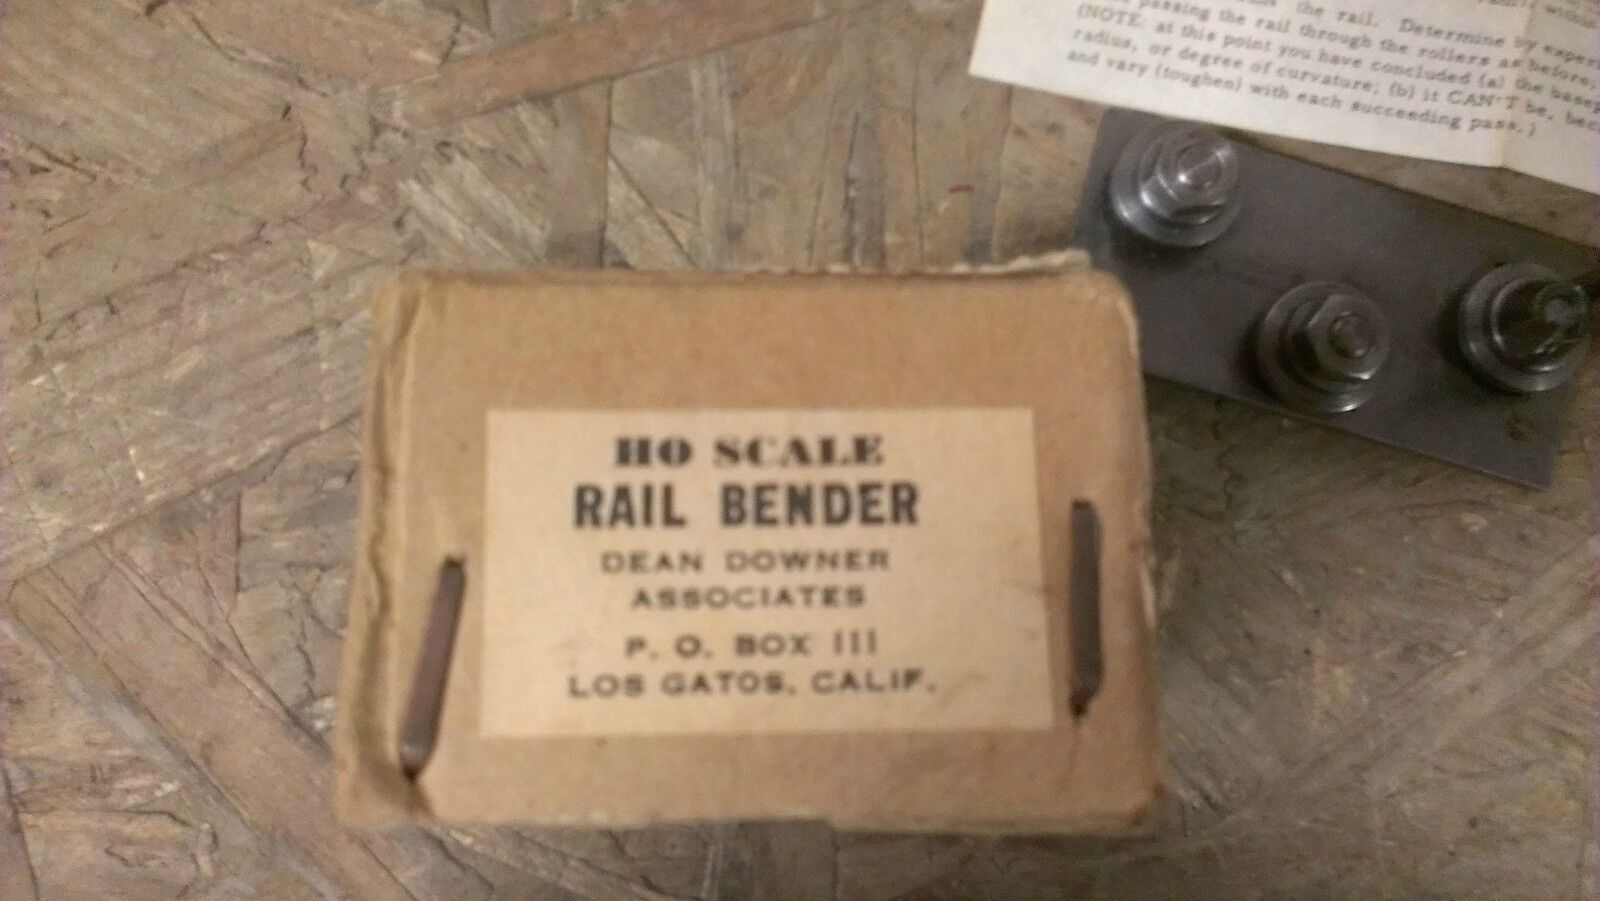 HO Scale Vintage Rail Bender By Dean Downer Associates